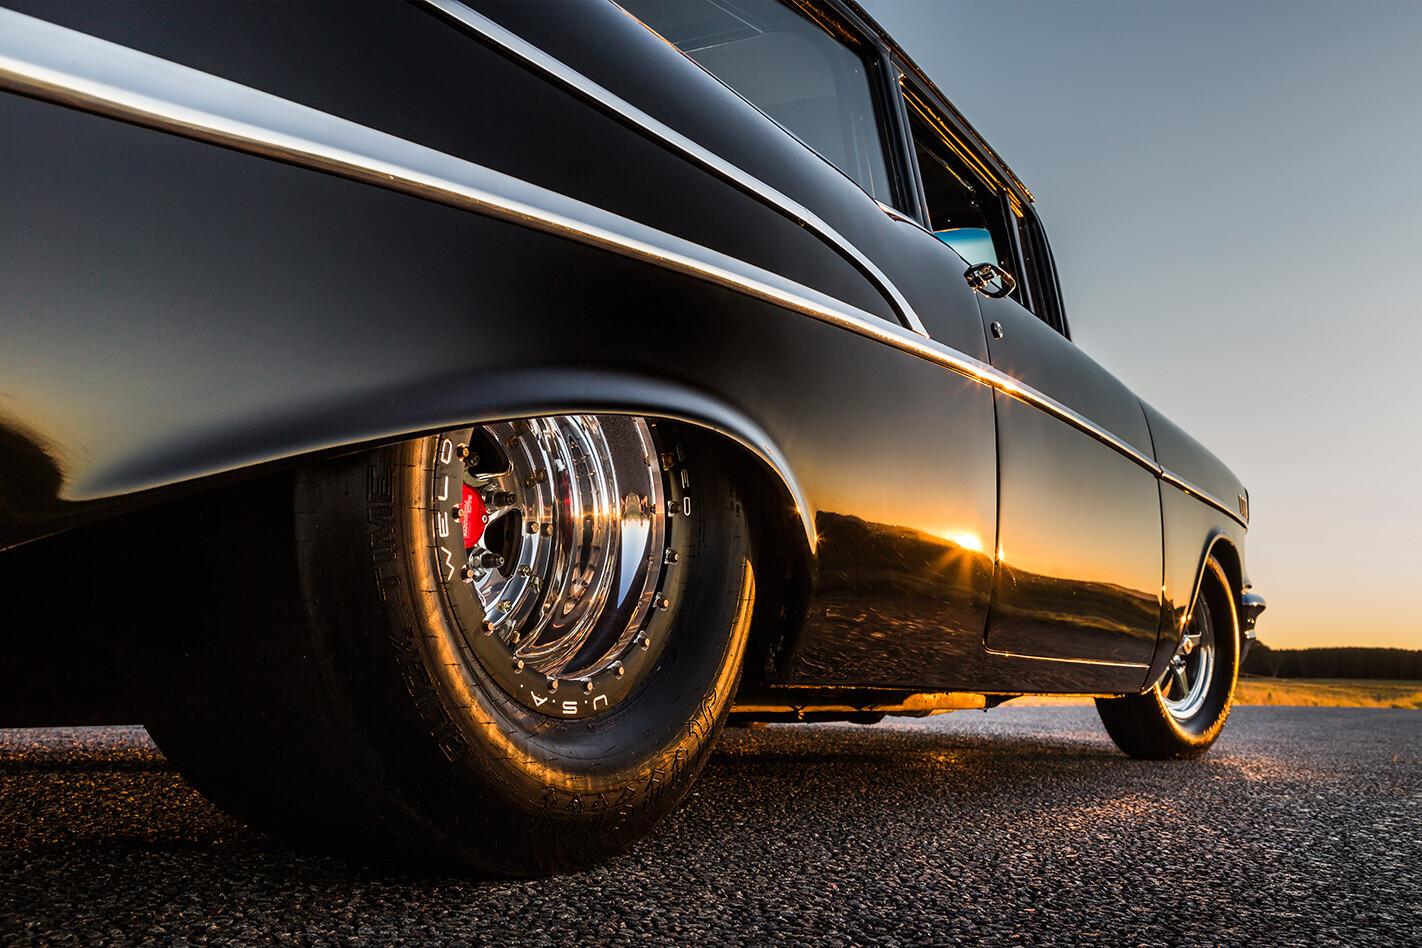 1957-Chevrolet -wheel